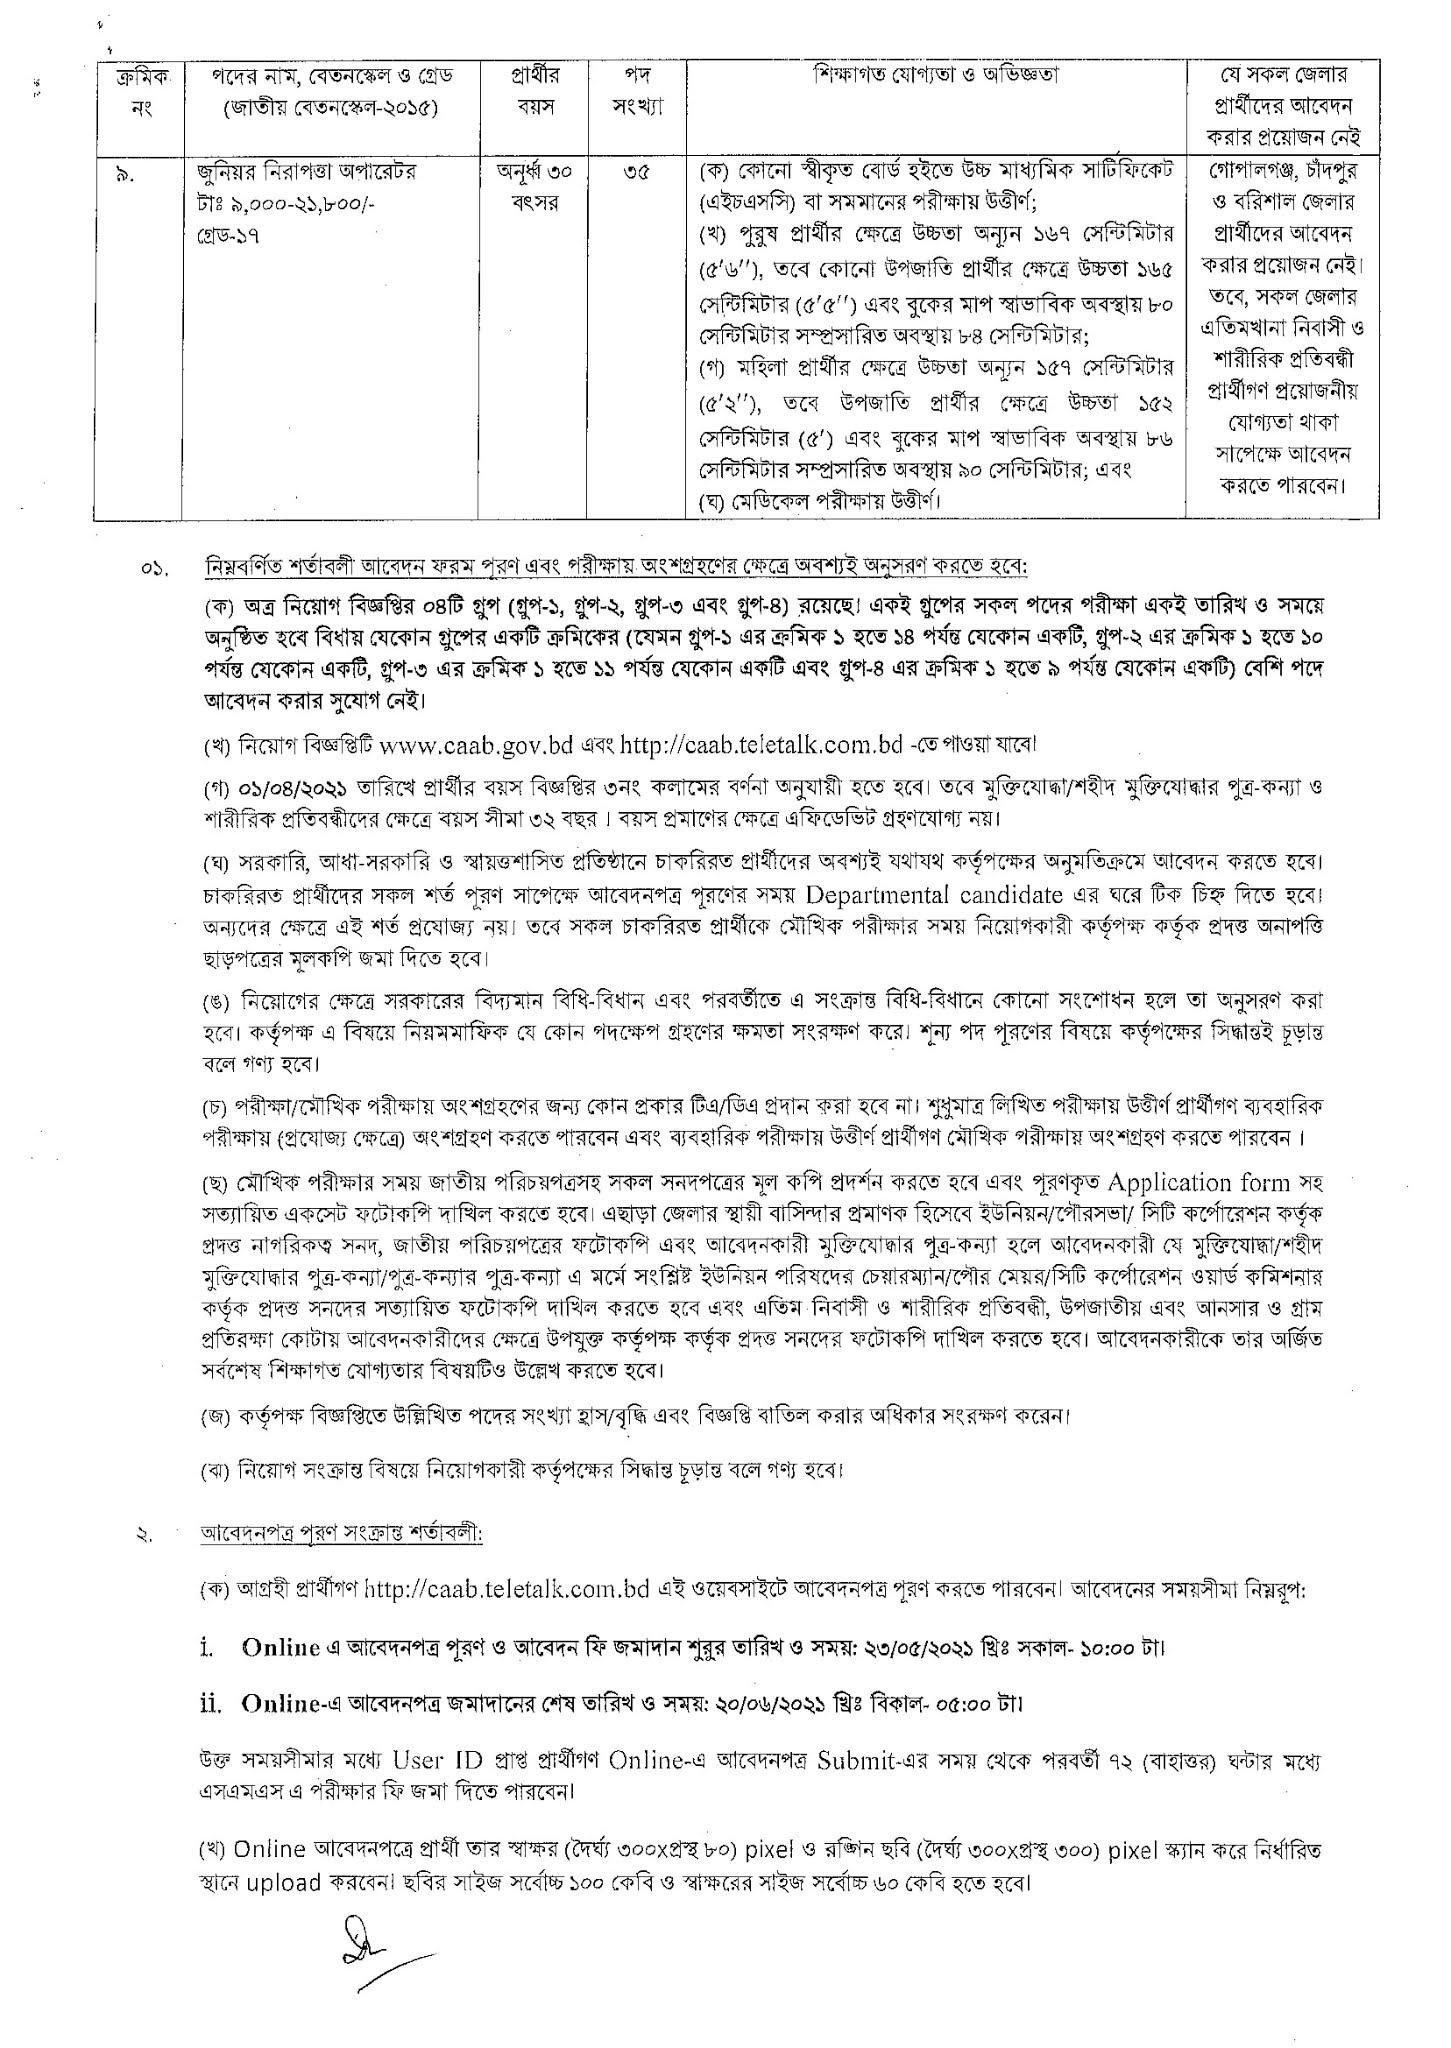 Civil Aviation Authority of Bangladesh Job Circular 2021